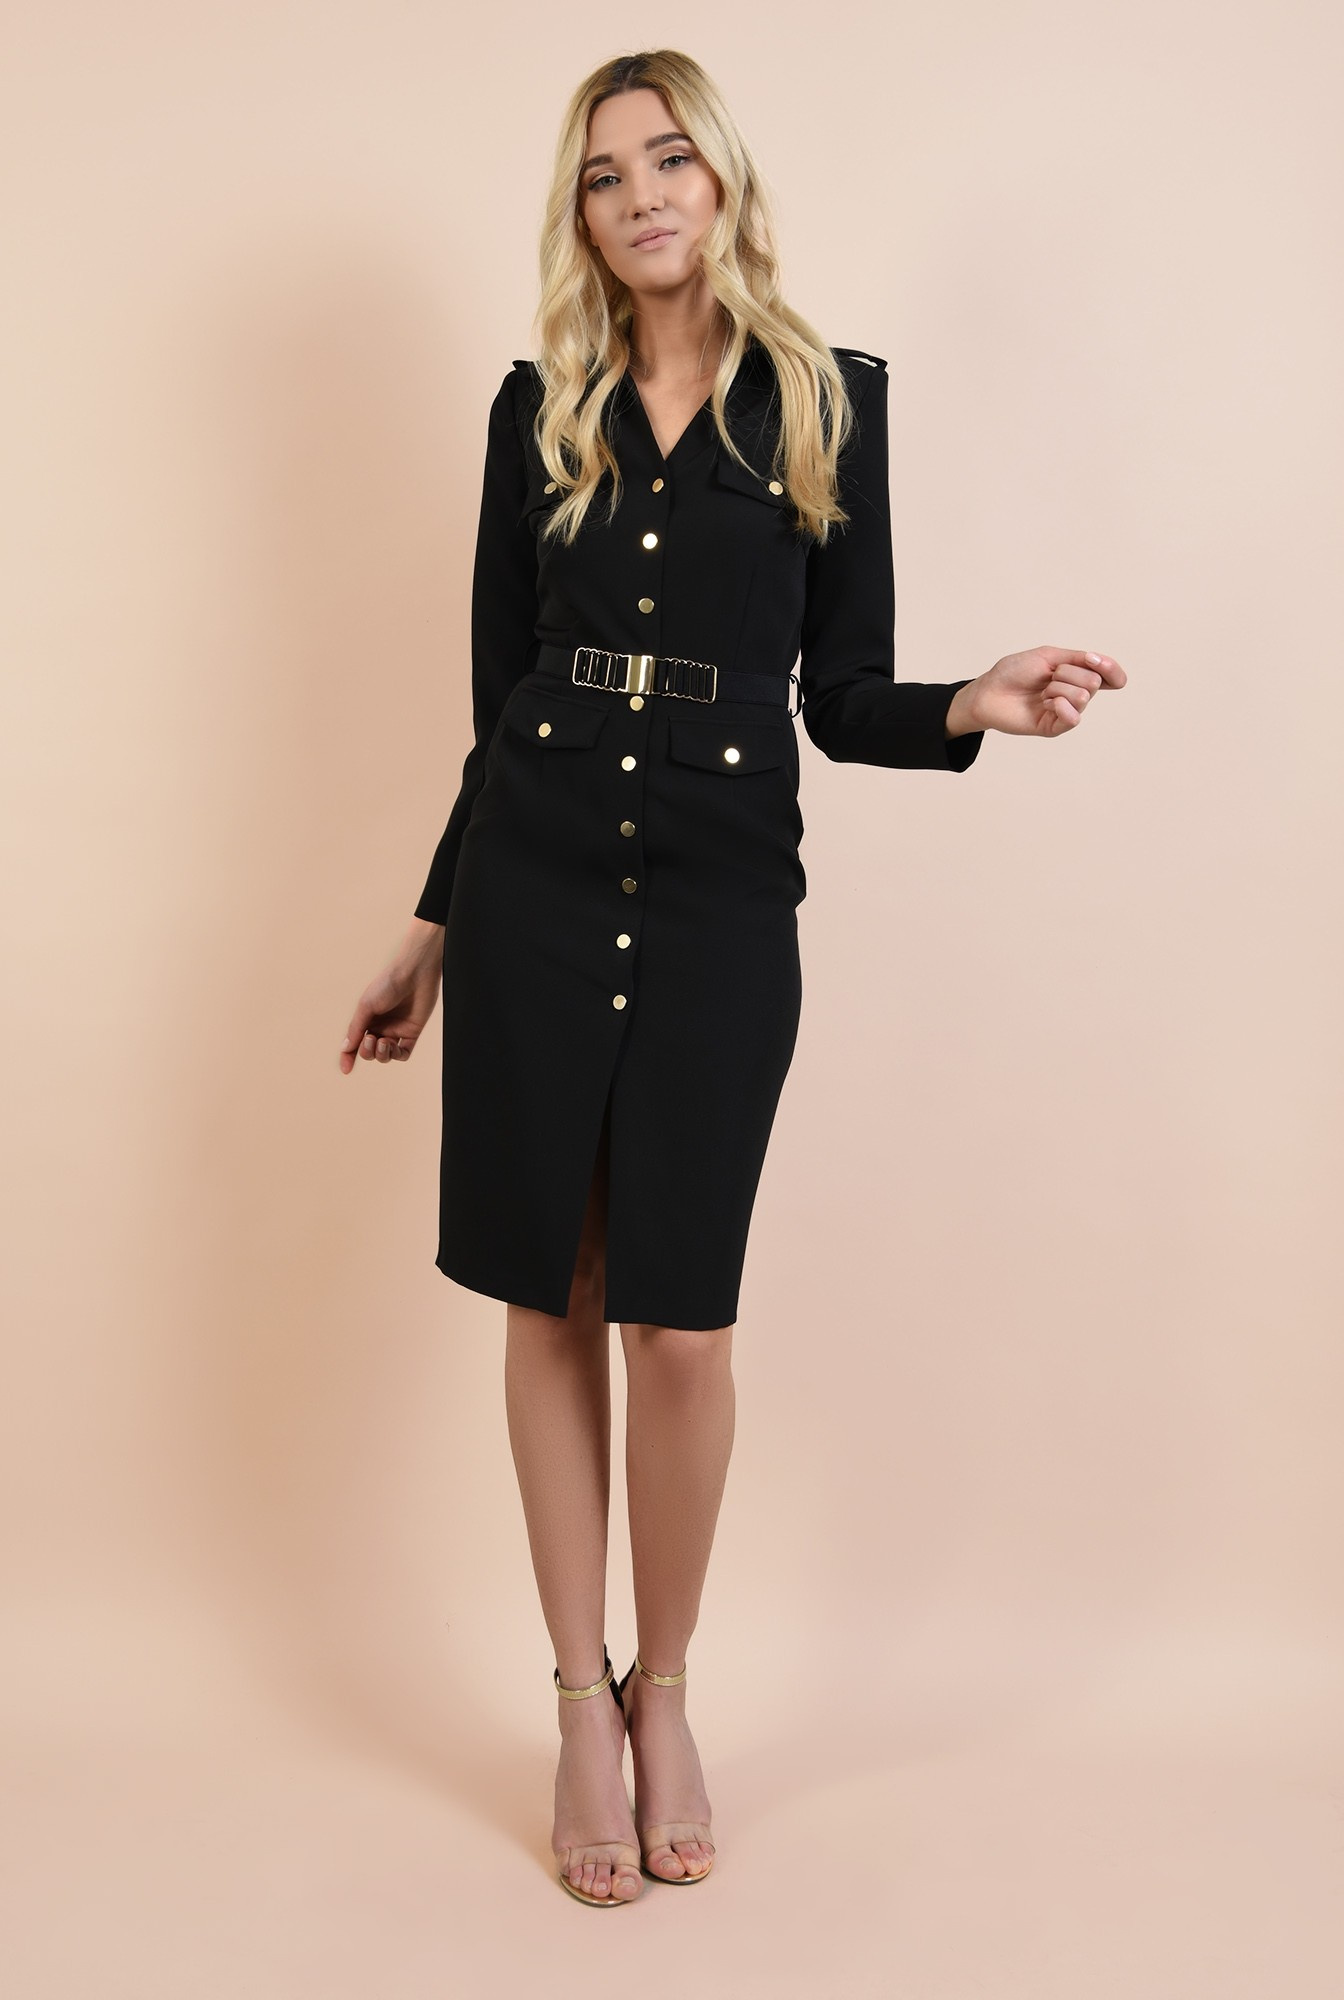 3 - rochie neagra, casual, nasturi aurii, epoleti, curea fronsata